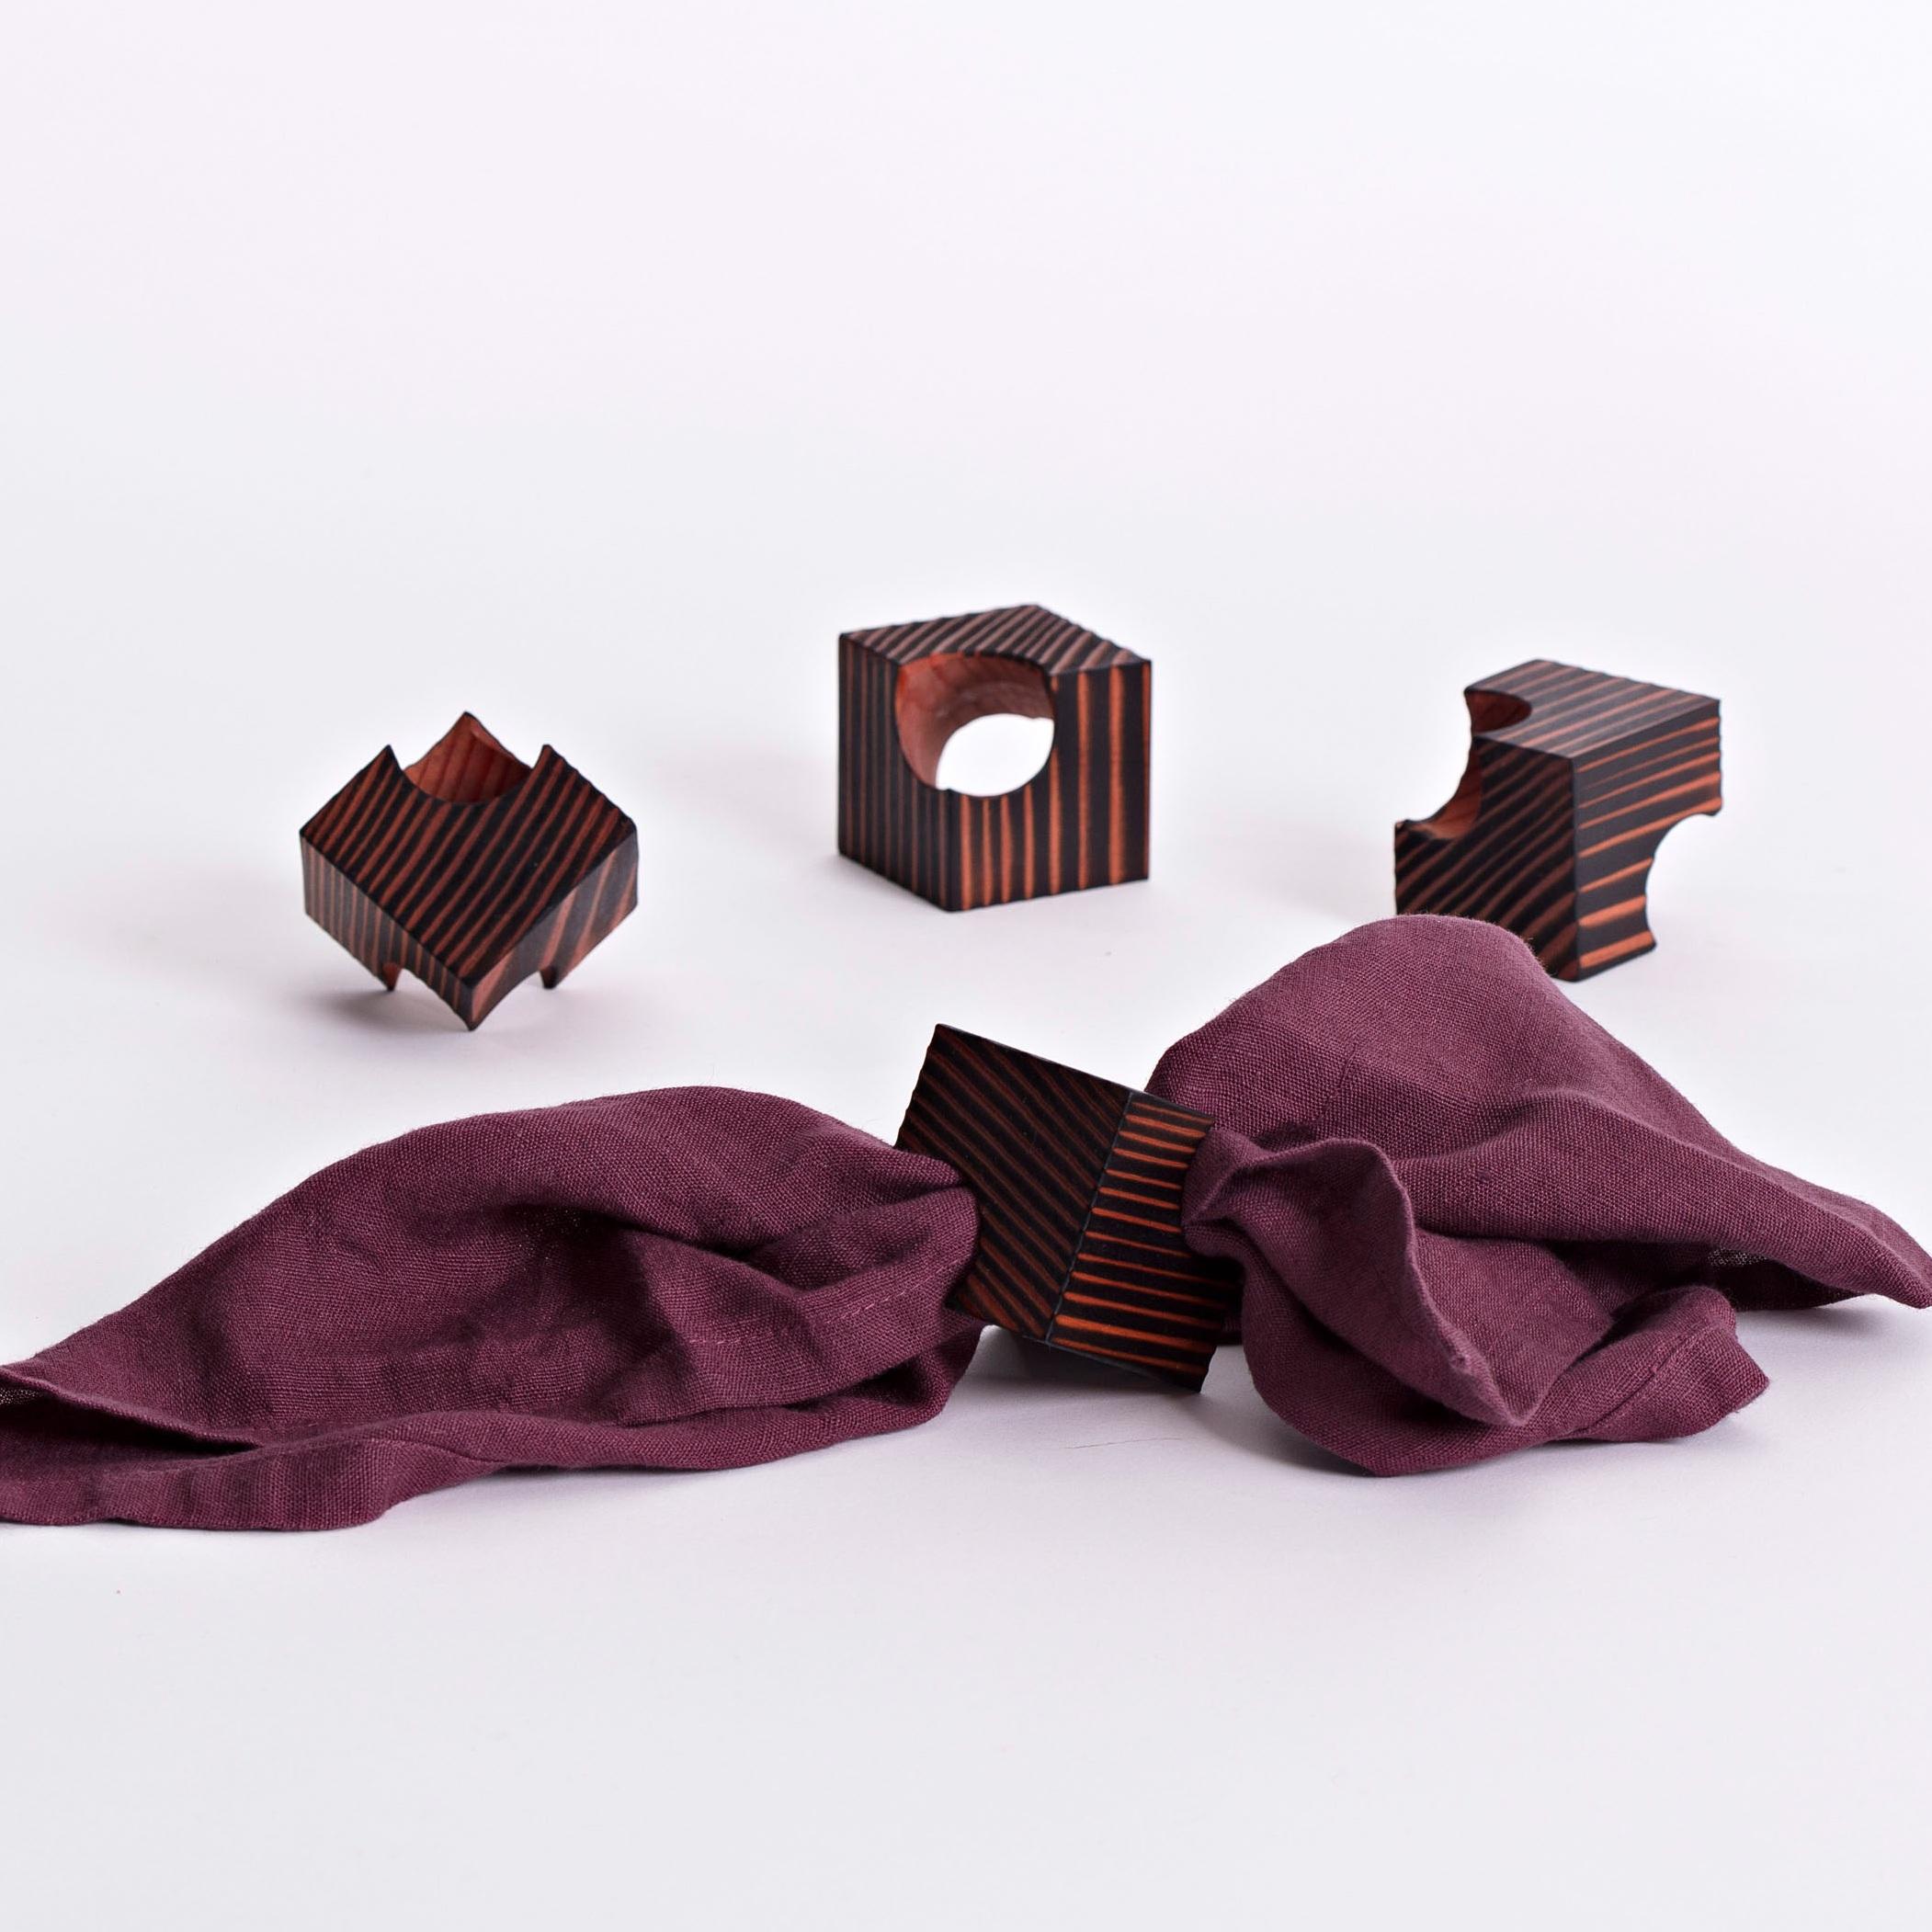 Details - Dimensions: 5cm cubePrice for set of 4: €95